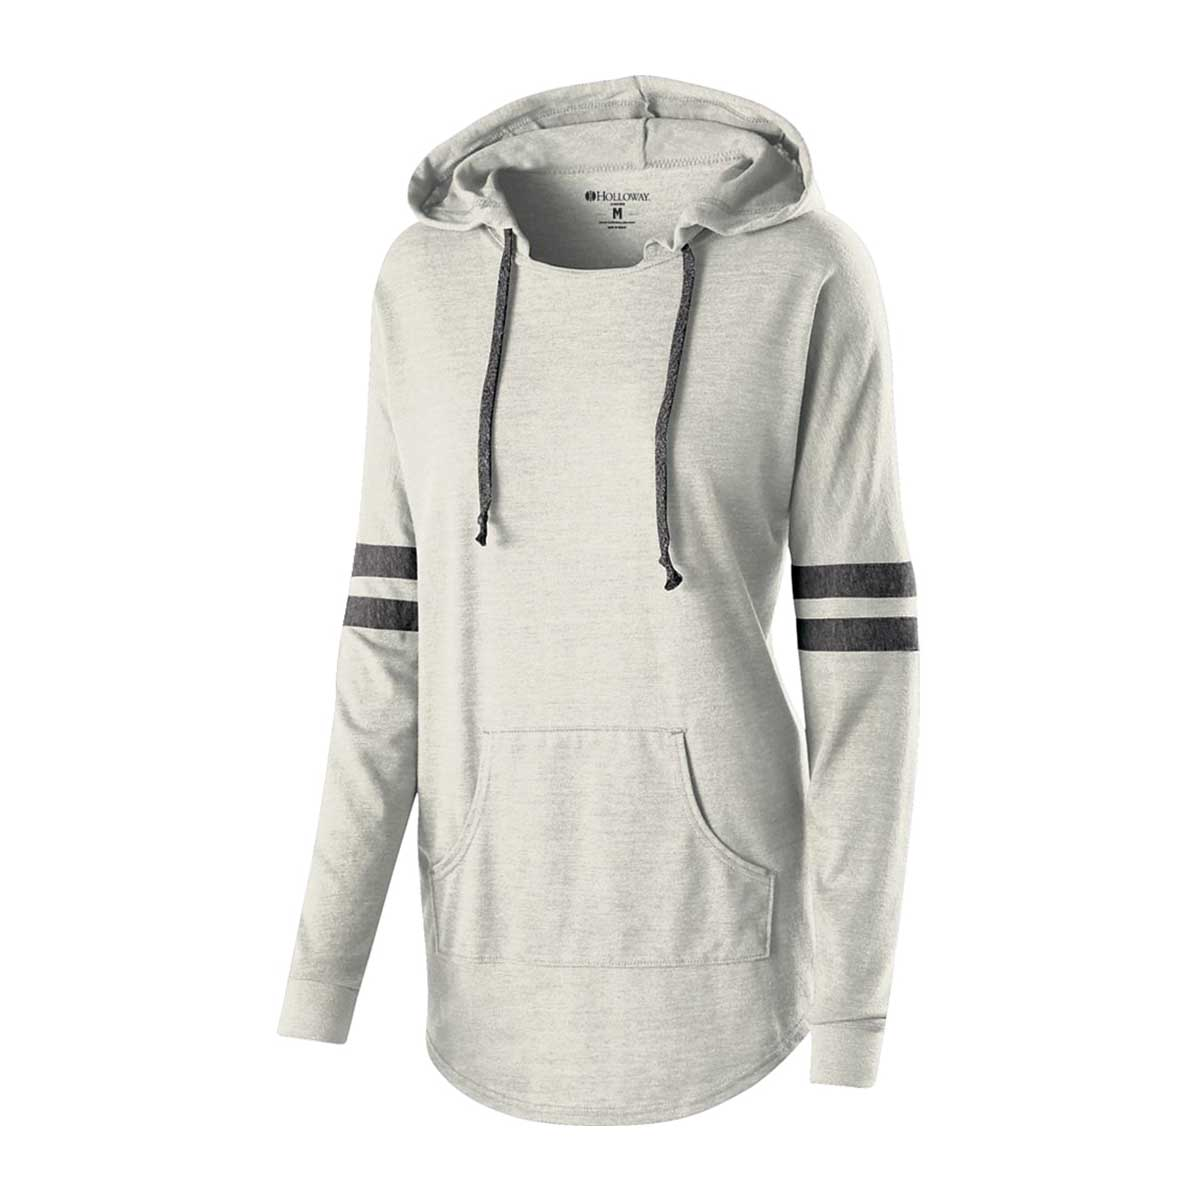 Off white ladies heather game day sweatshirt